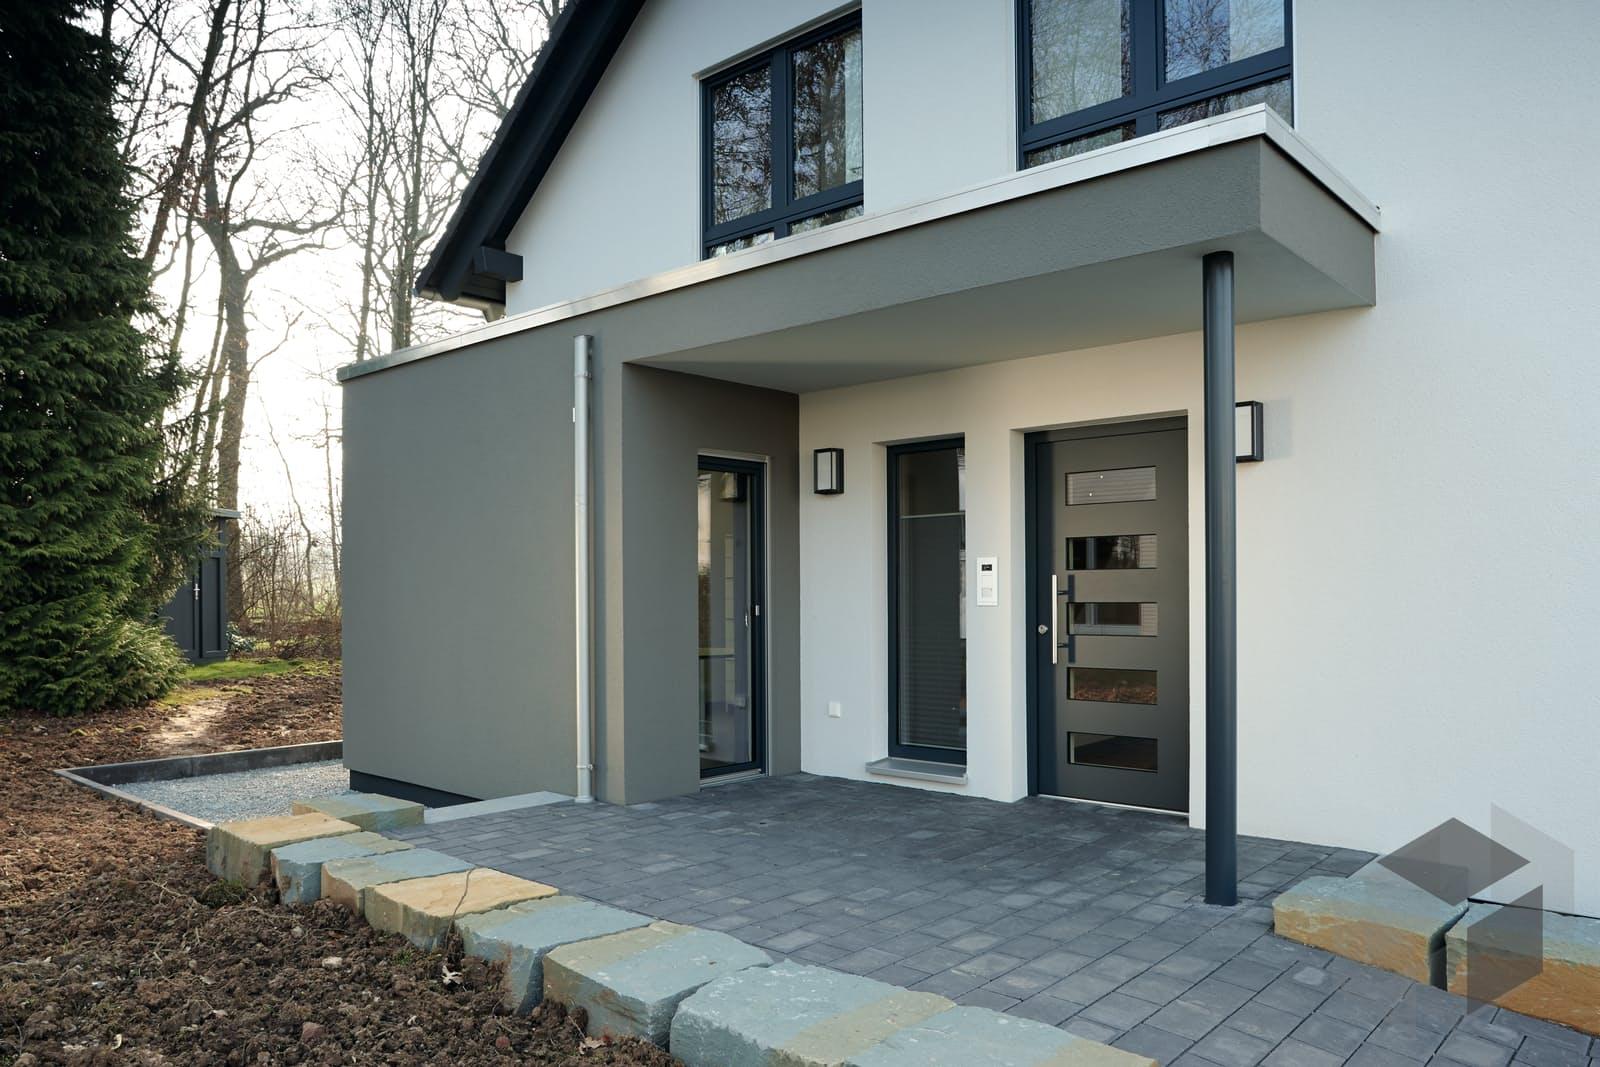 neo 312 musterhaus bad vilbel von fingerhaus komplette daten bersicht. Black Bedroom Furniture Sets. Home Design Ideas